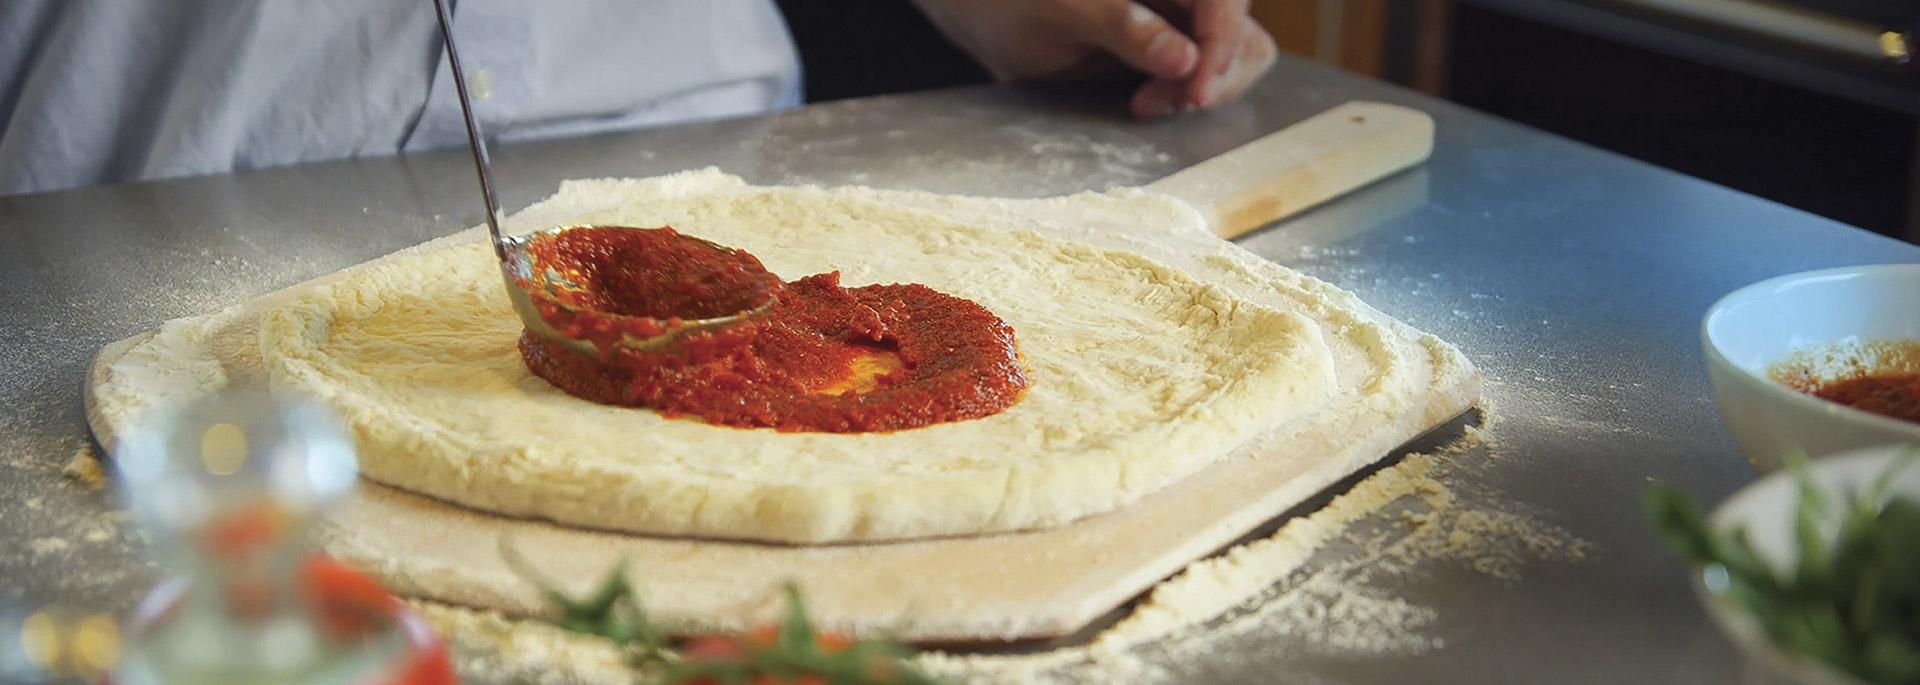 https://www.lacesenate.it/wp-content/uploads/2020/12/ristorazione.jpg